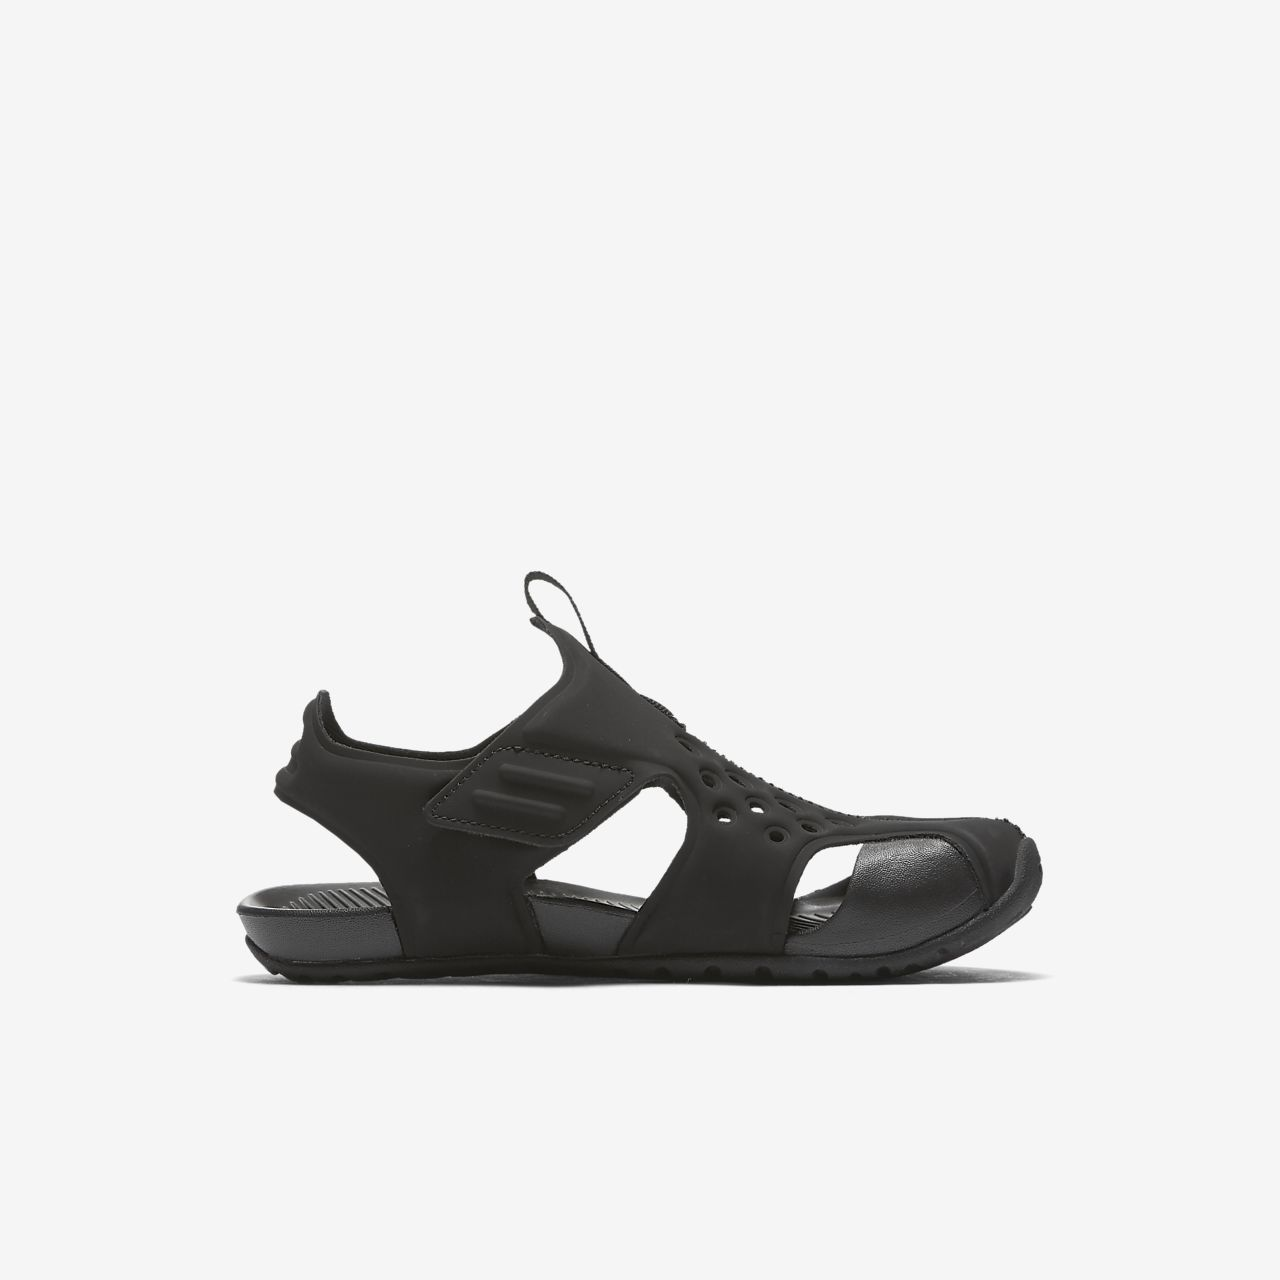 Nike Claquette NIKE SUNRAY PROTECT 2 NOIR Noir - Chaussures Basket Homme